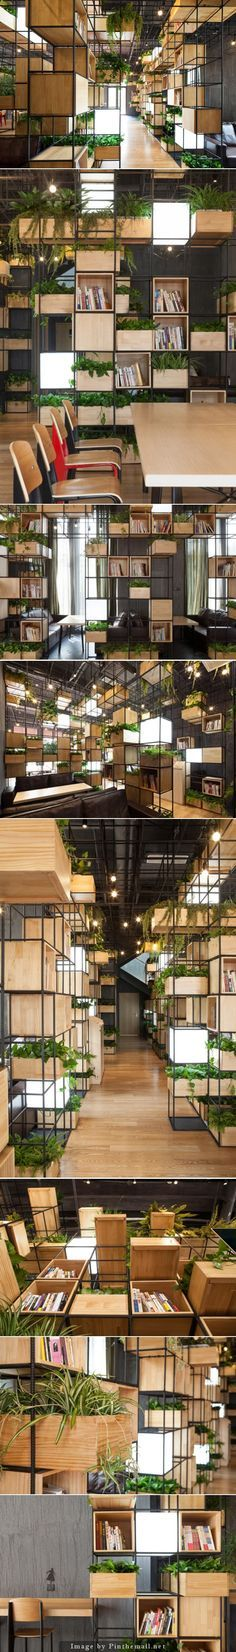 PENDA - Modular shelves & planters - Wooden box shelves and planters and light cubes populate a gridded metal framework